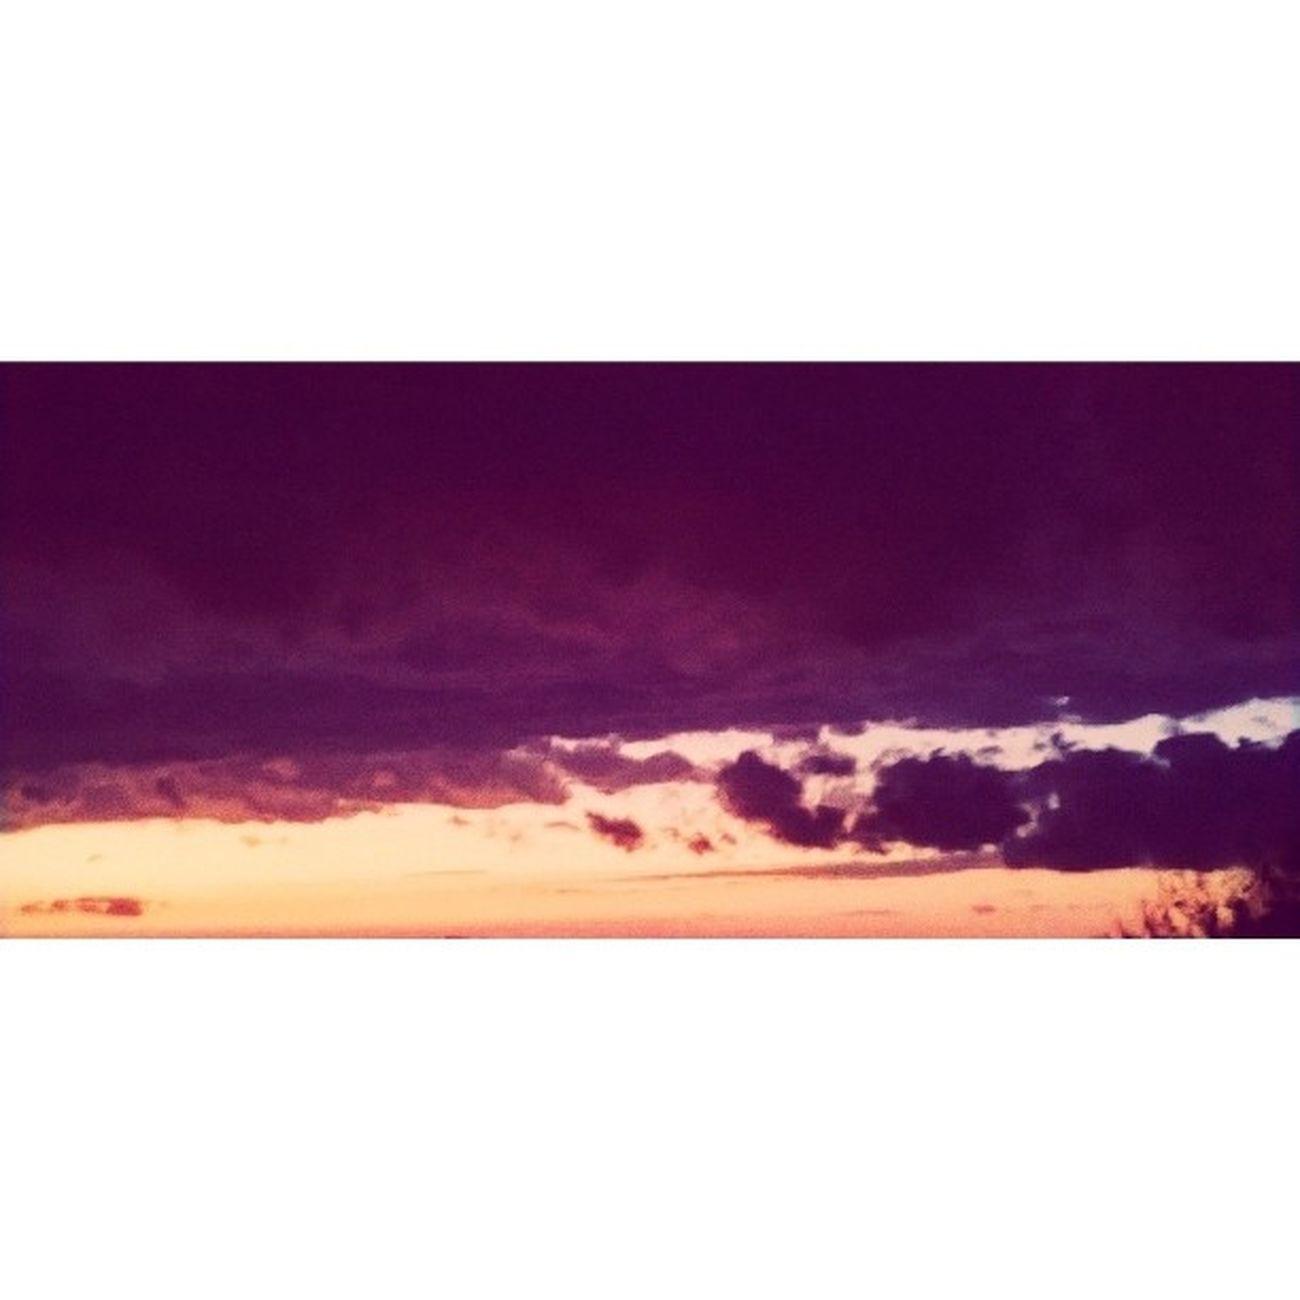 Gökyüzünün pembesi çok güzel gelsene? 🌁😍 Viavsco Fotosentez Fotografasigii Gokyuzu skyseptemberphotographphotographyvscovscoturkeywebstagraminstagoodinstadailyinstagoodlikeforliketagsforperfect